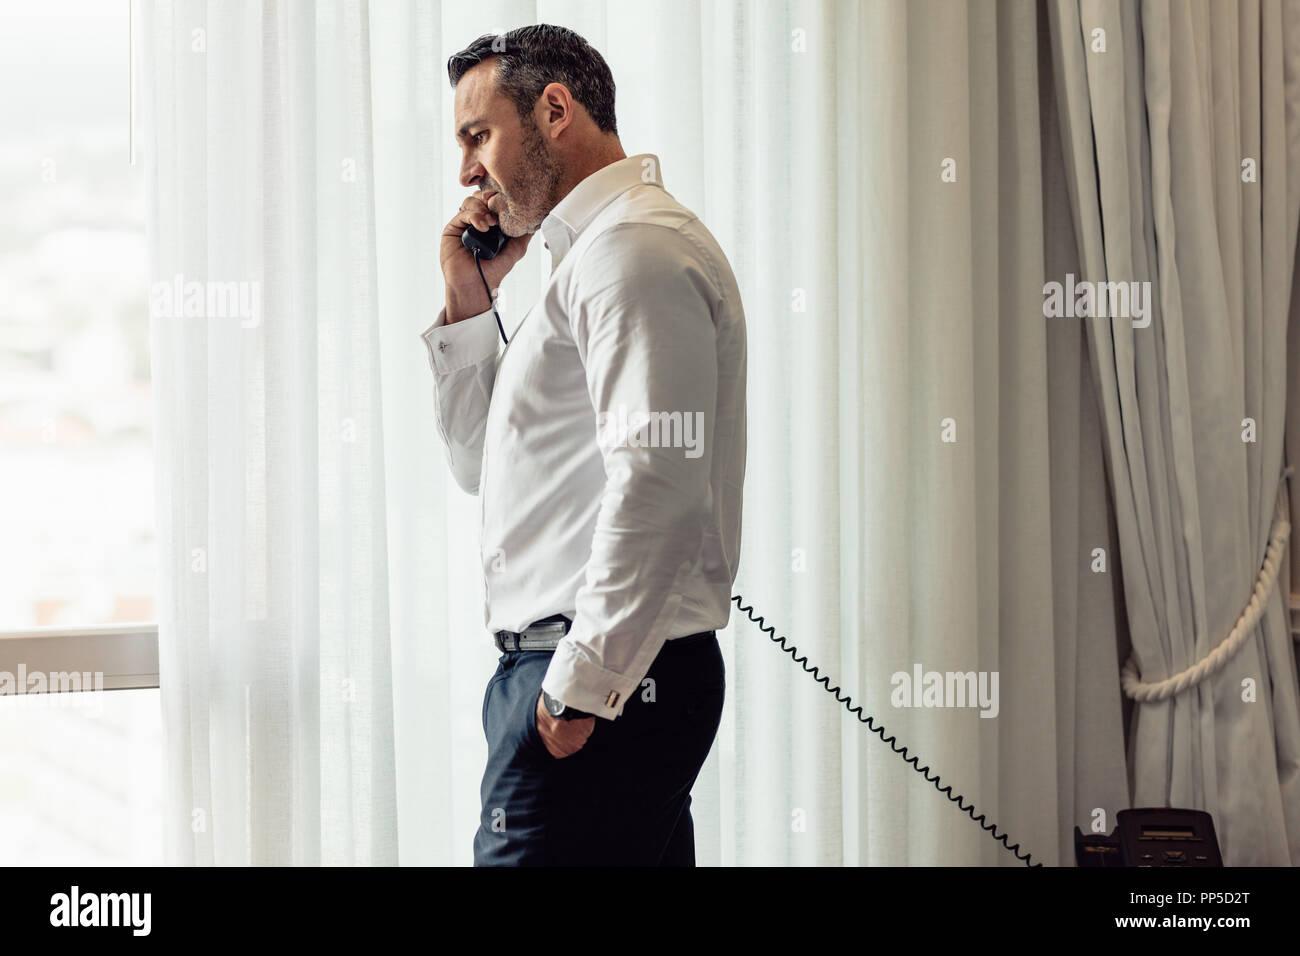 Businessman in formals talking over landline phone. Handsome businessman making call from hotel room. - Stock Image